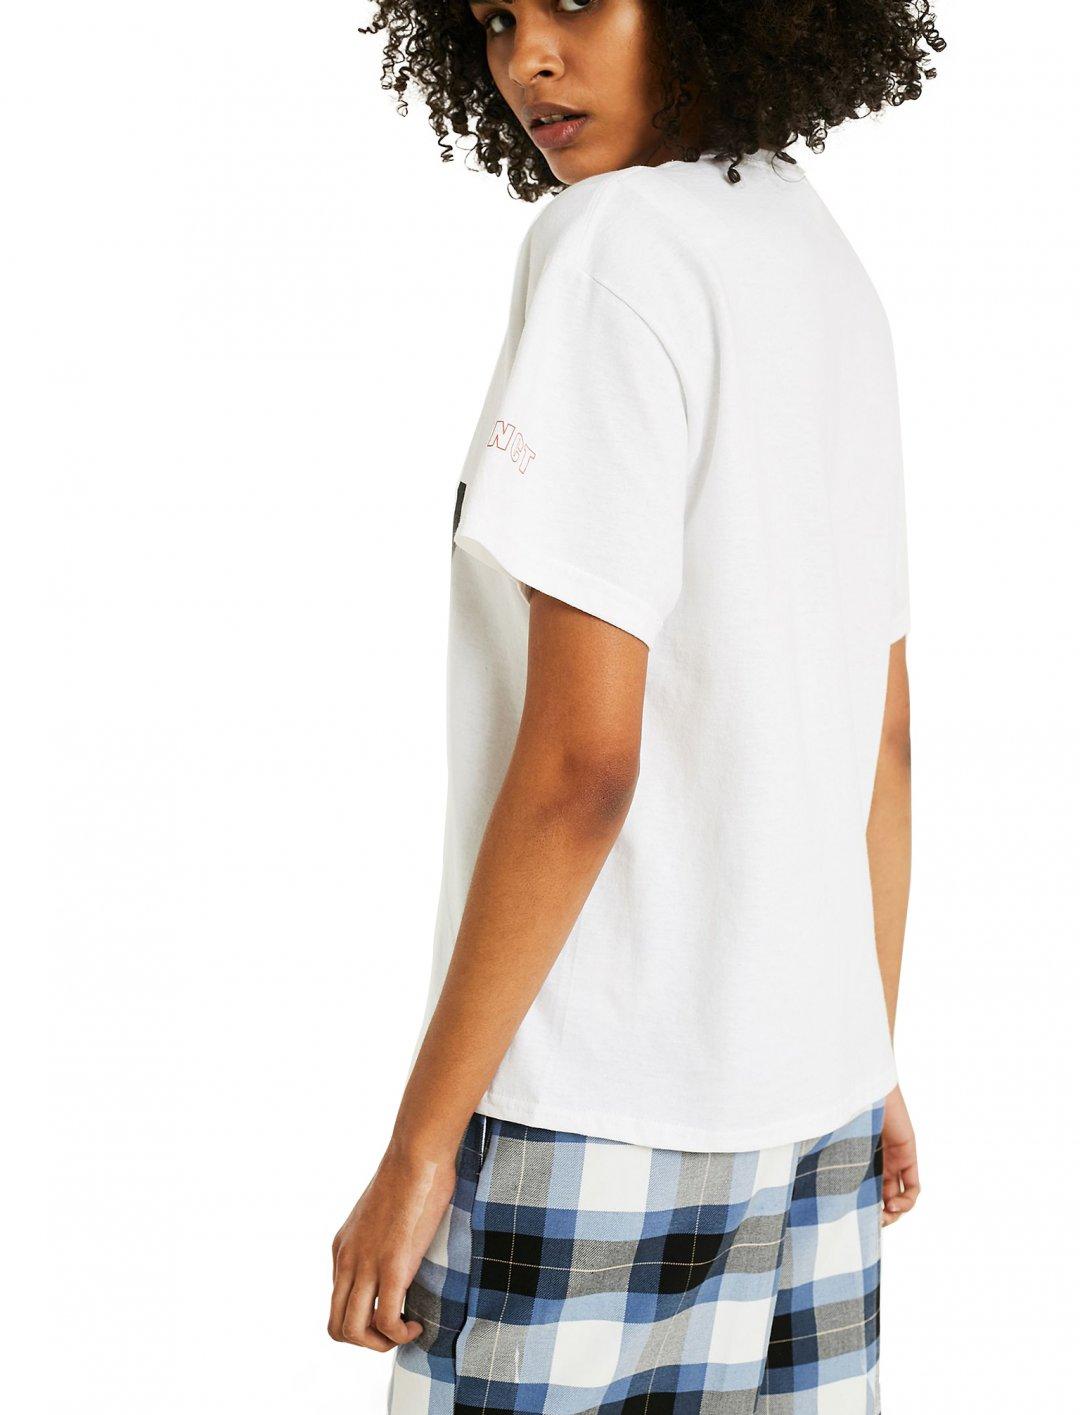 UO Palm Tree T-Shirt Clothing UO